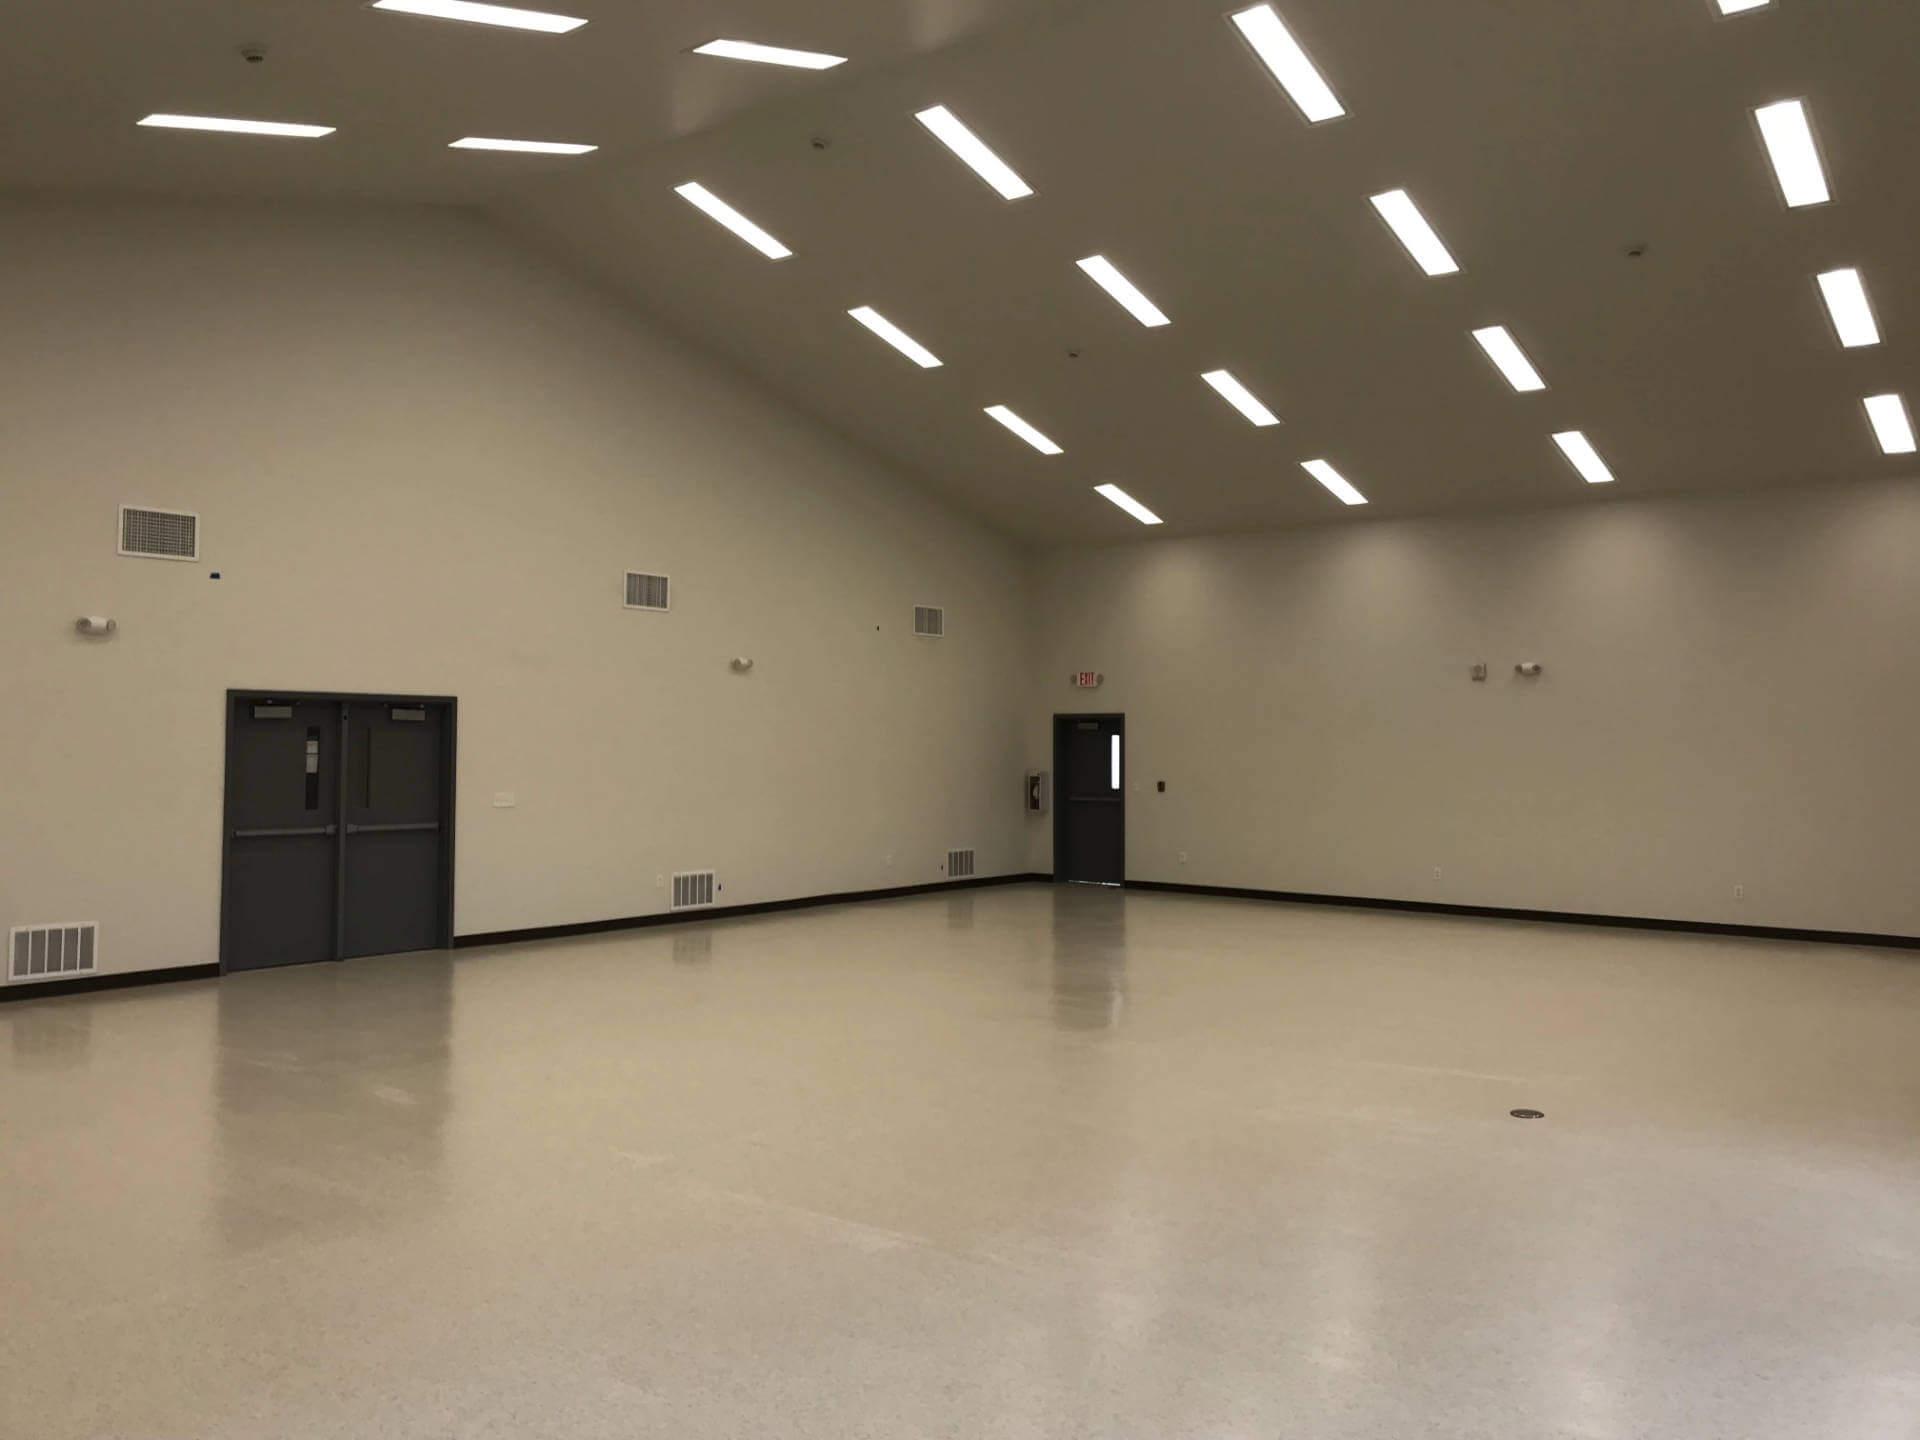 Heights School Interior 2-1-1